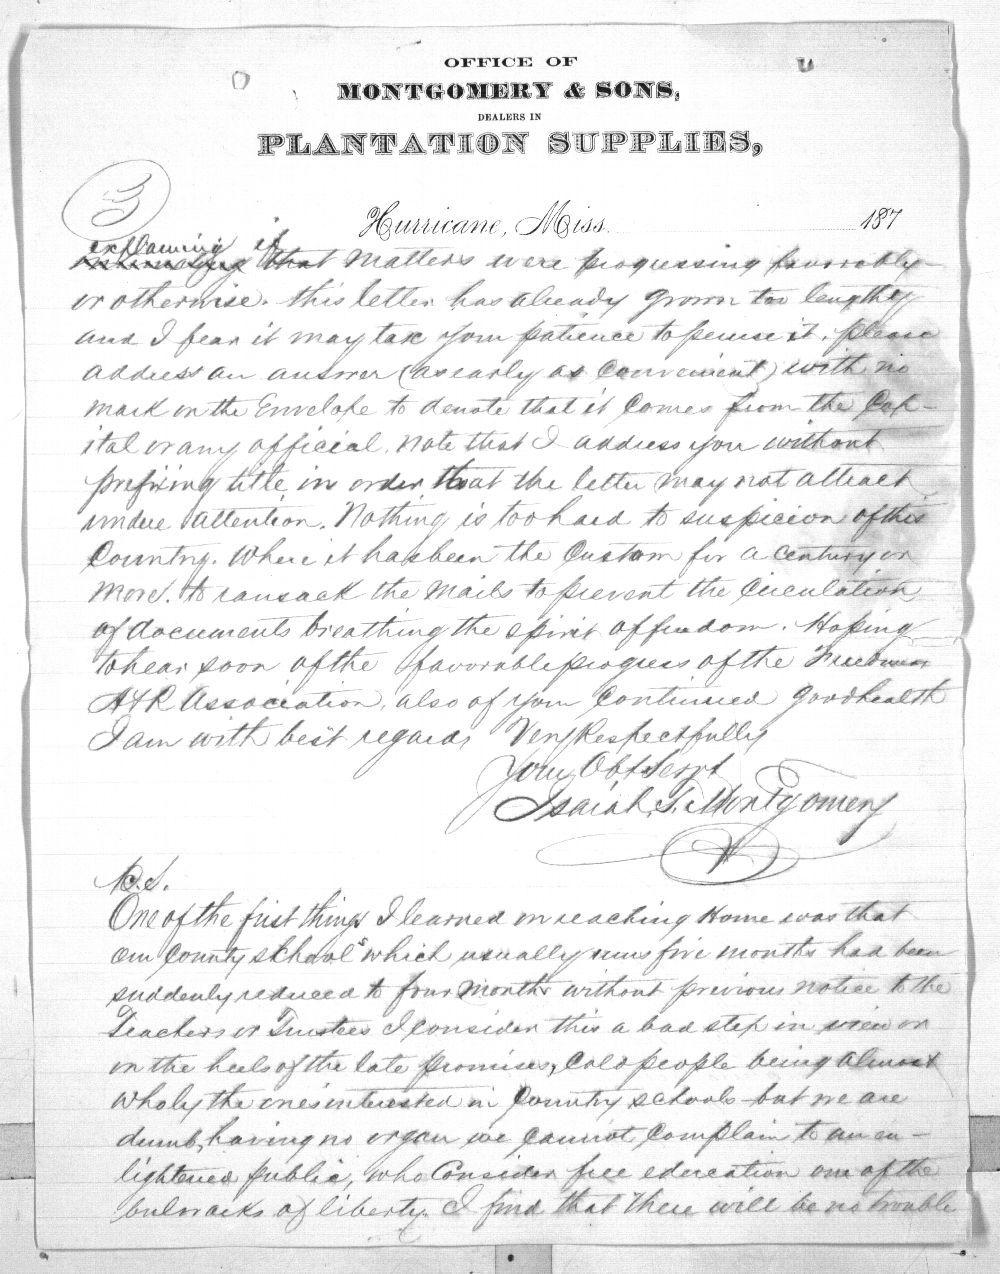 Isaiah T. Montgomery to Governor John P. St. John - 5